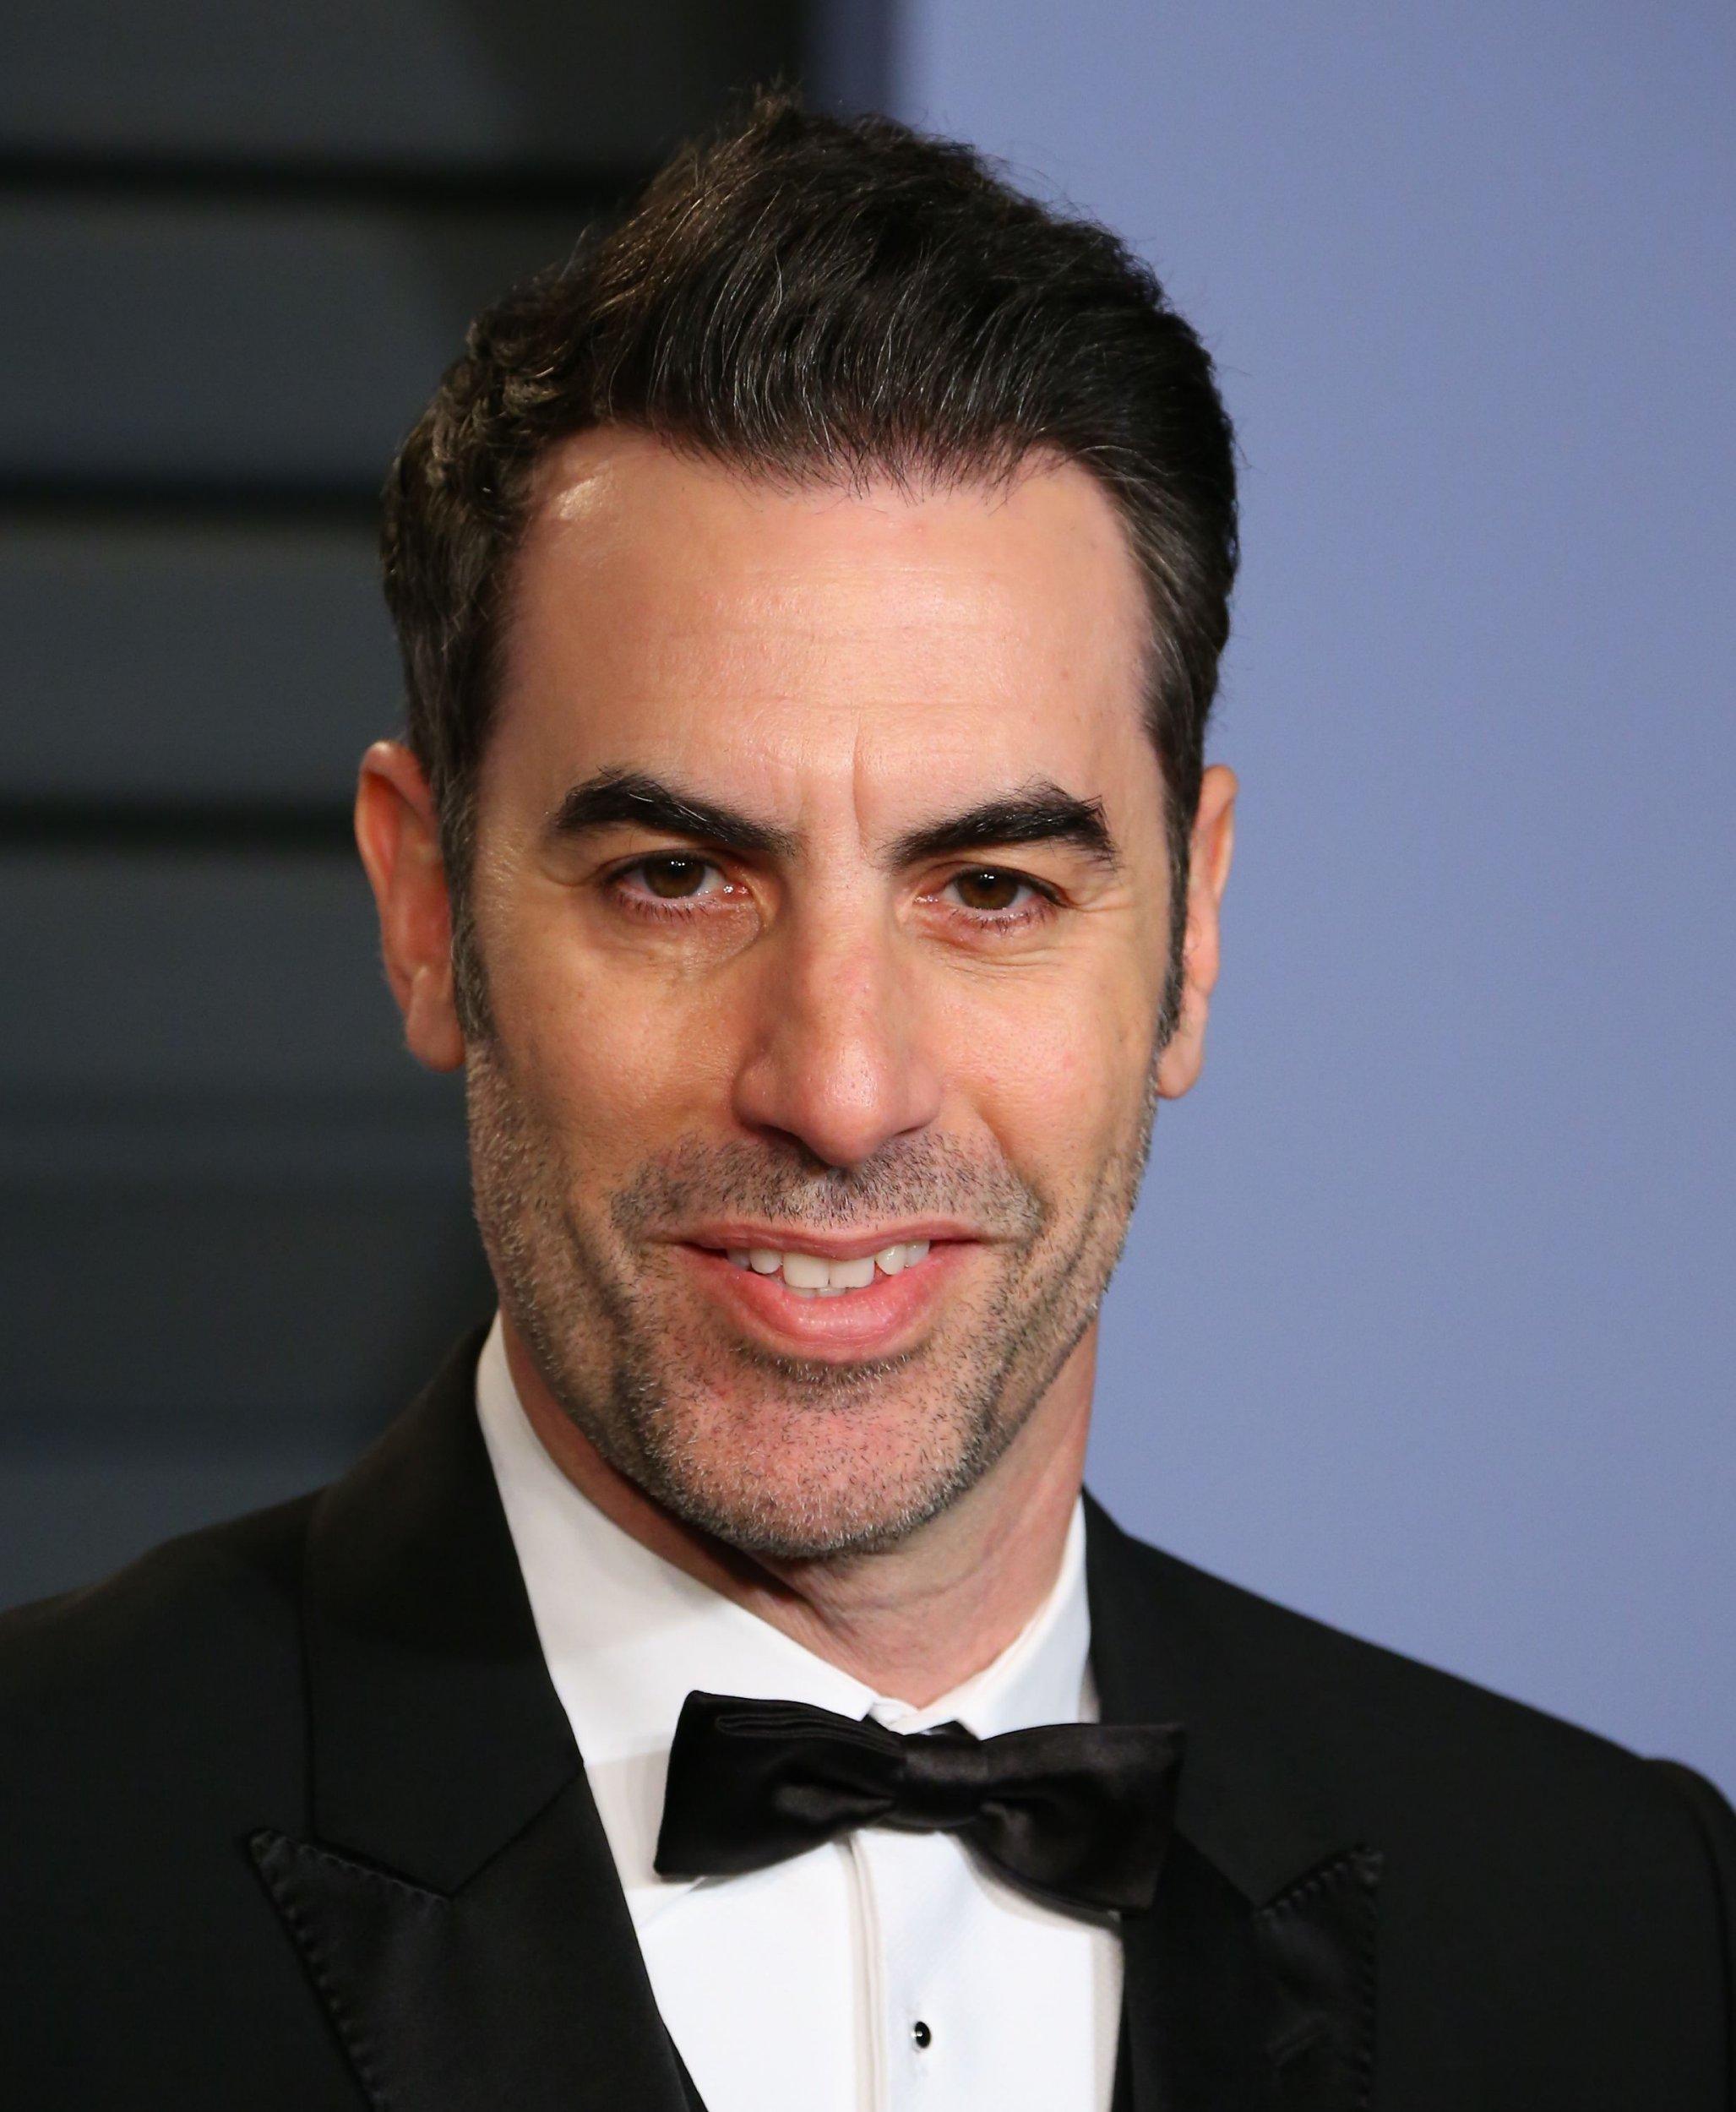 Sacha Baron Cohen returns to TV to play Israeli spy in new Netflix thriller